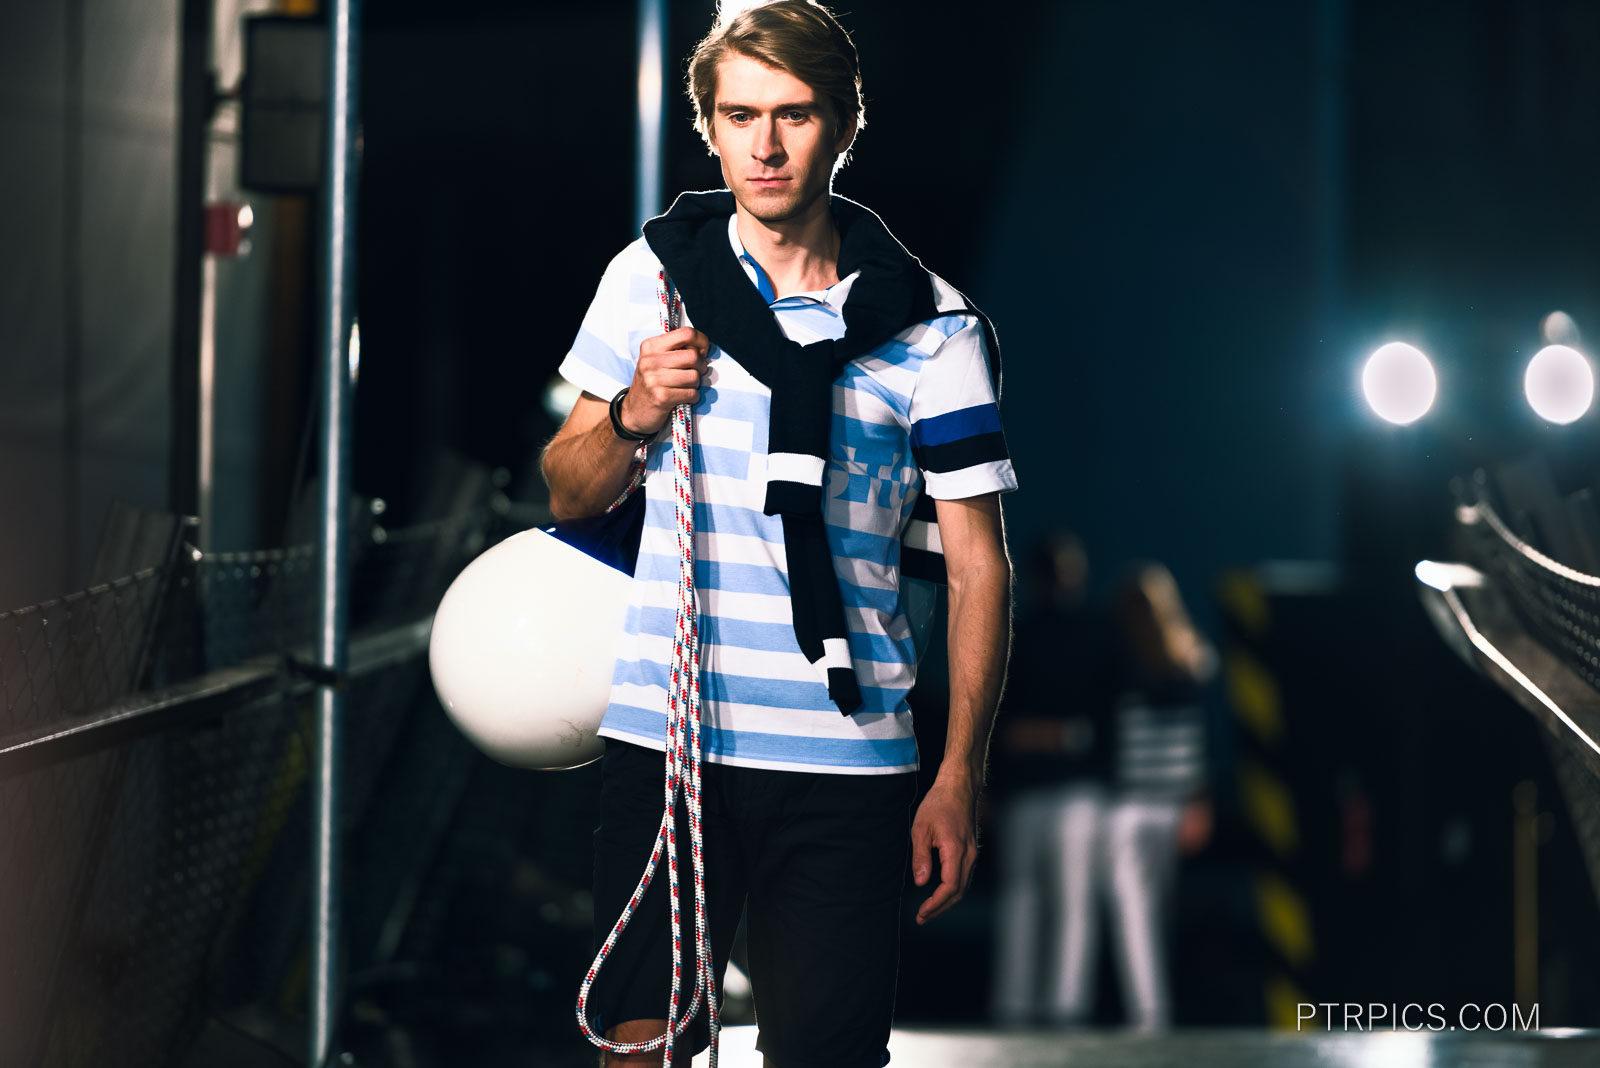 Estonian Uniform for Rio Olympics 2016